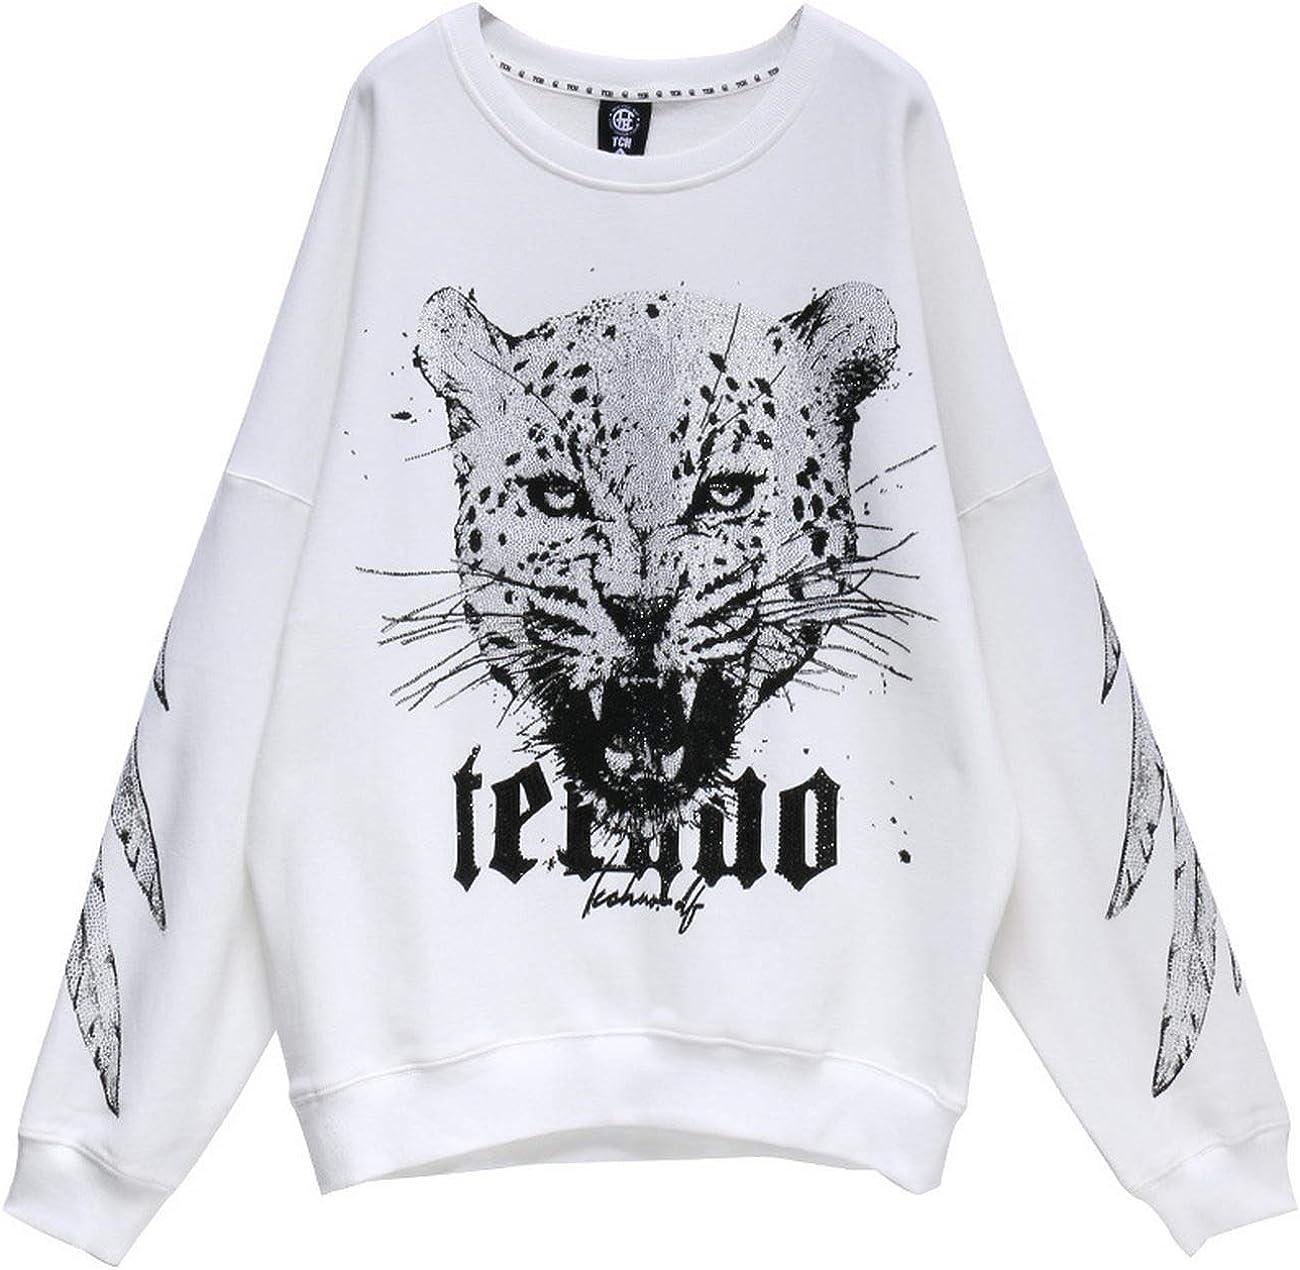 Light Luxury Tide Brand Big C hot Beads Sweater Men and Women T203116D09 Money Online